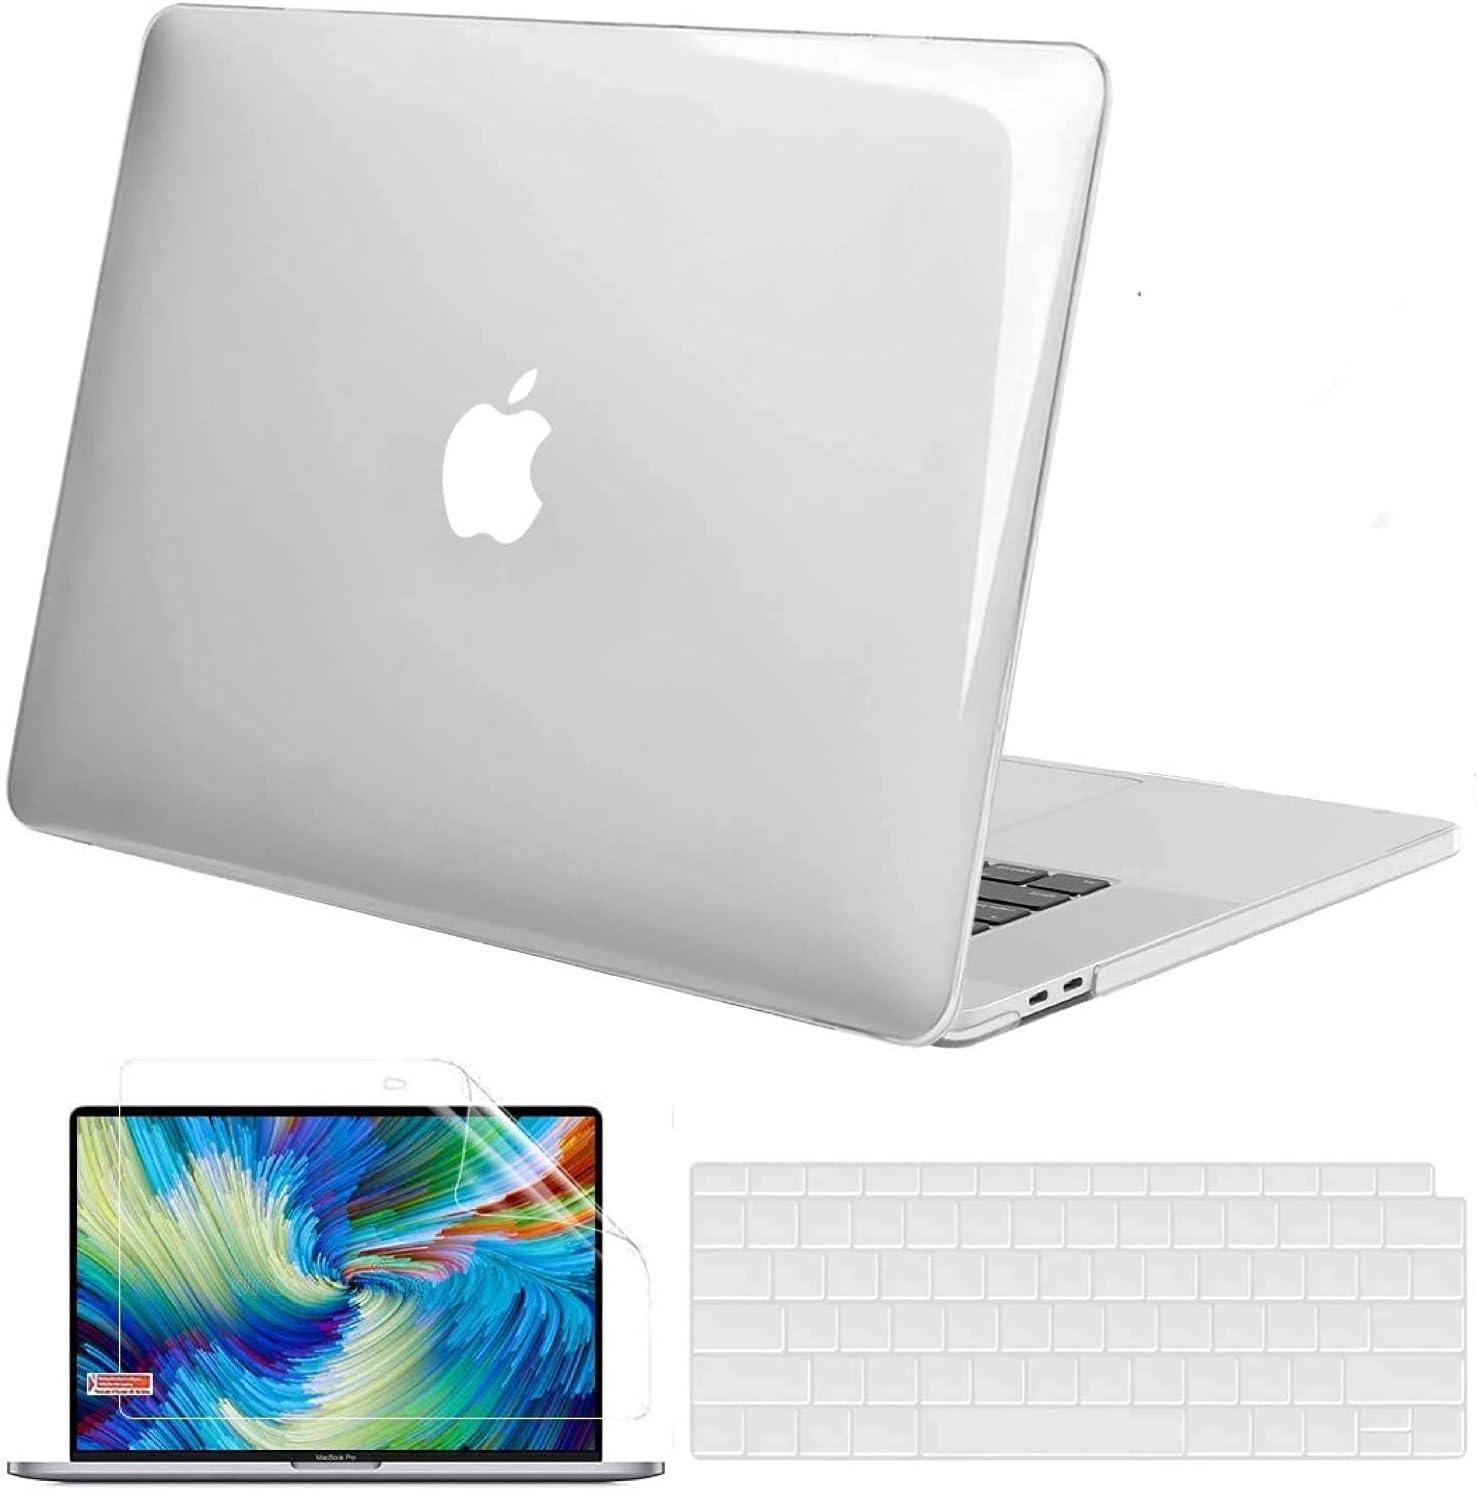 GVTECH Para MacBook Pro 13 pulgadas Crystal Clear Case 2016-2020 (A2338 M1/A2289/A2251/A2159/A1706/A1989), cubierta protectora de plástico duro cubierta y cubierta de teclado y teclado para Pr